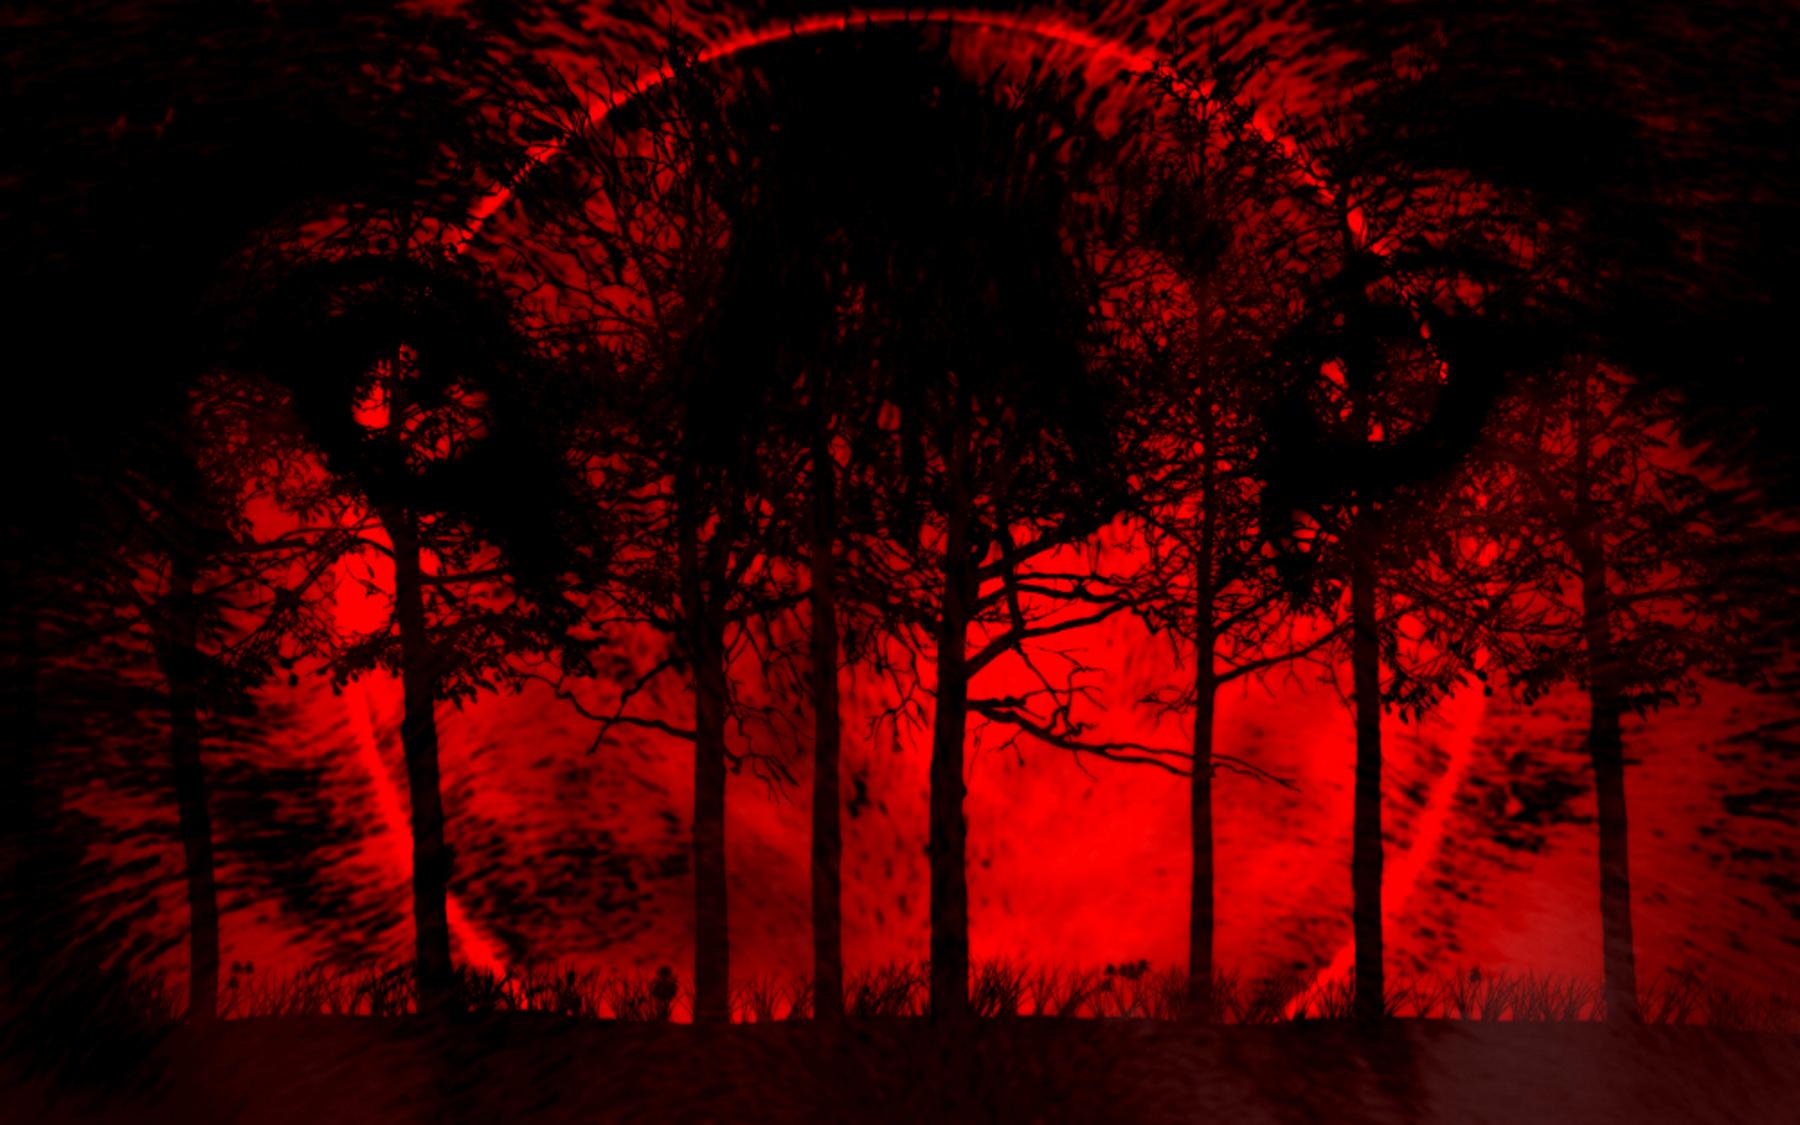 bloodred moon by amberwolffang4 on deviantart